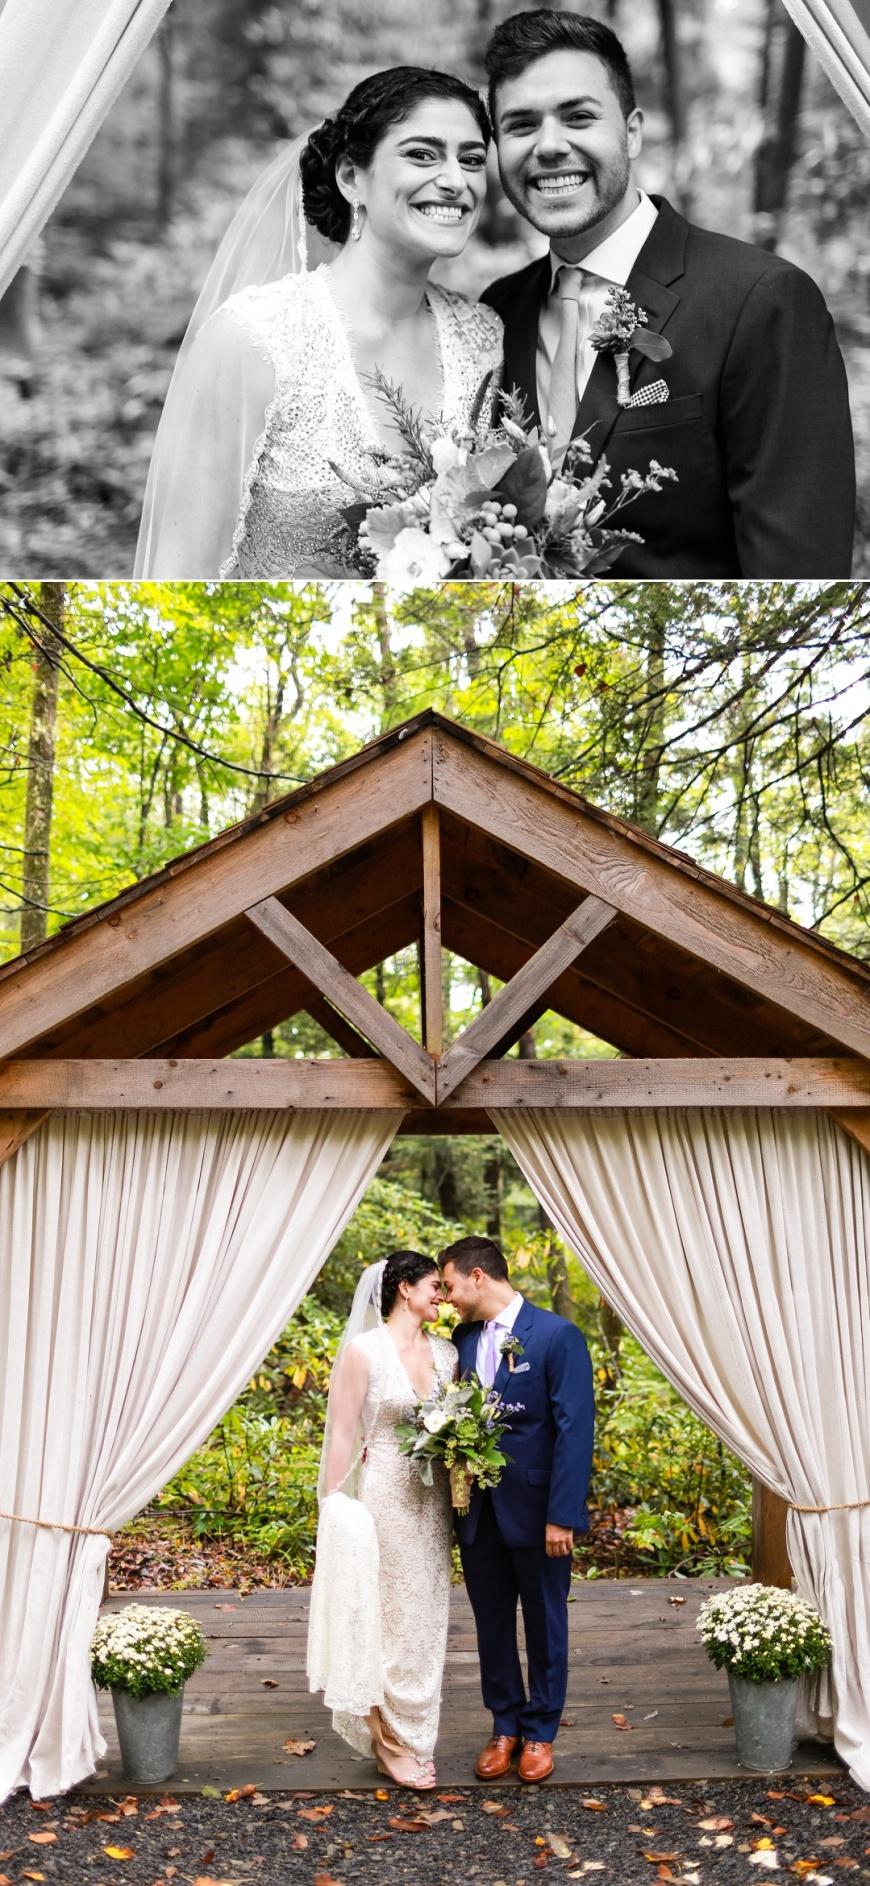 Tall-Timber-Barn-Poconos-Wedding-Photographer_1045.jpg